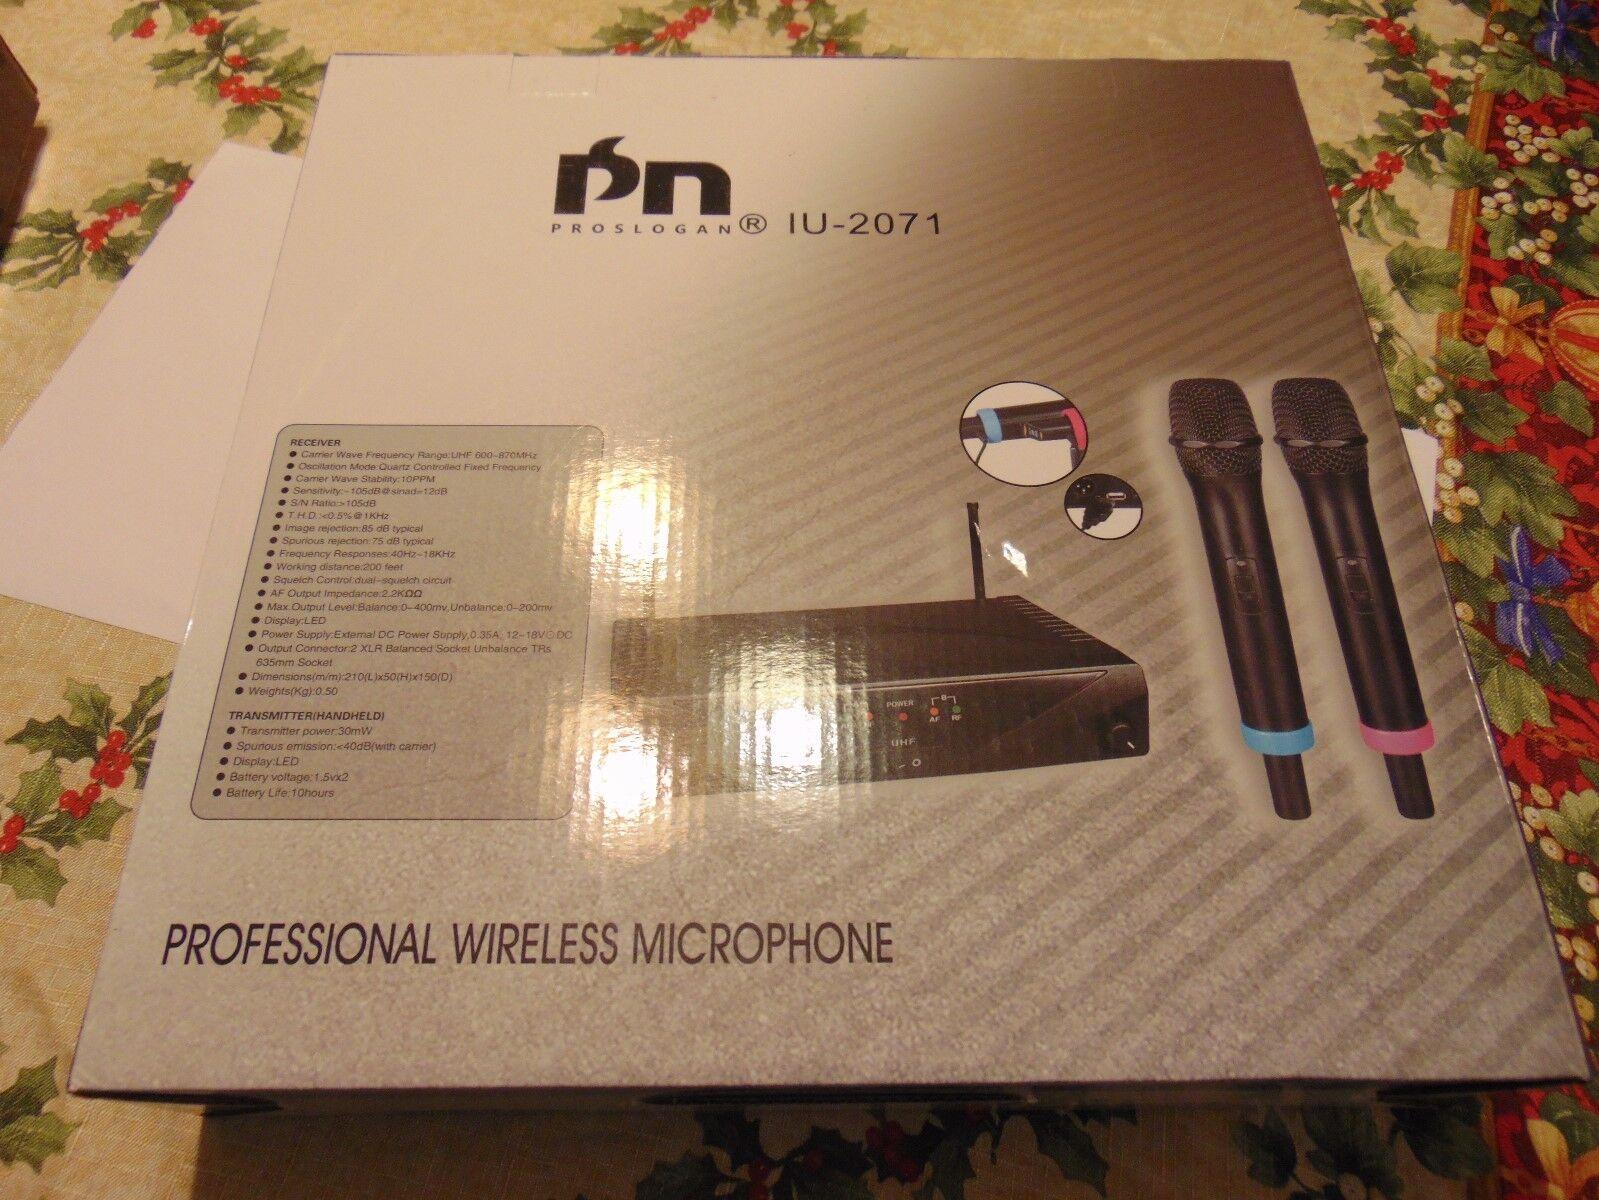 PROFESSIONAL WIRELESS MICROPHONE BY PROSLOGAN IU-2071